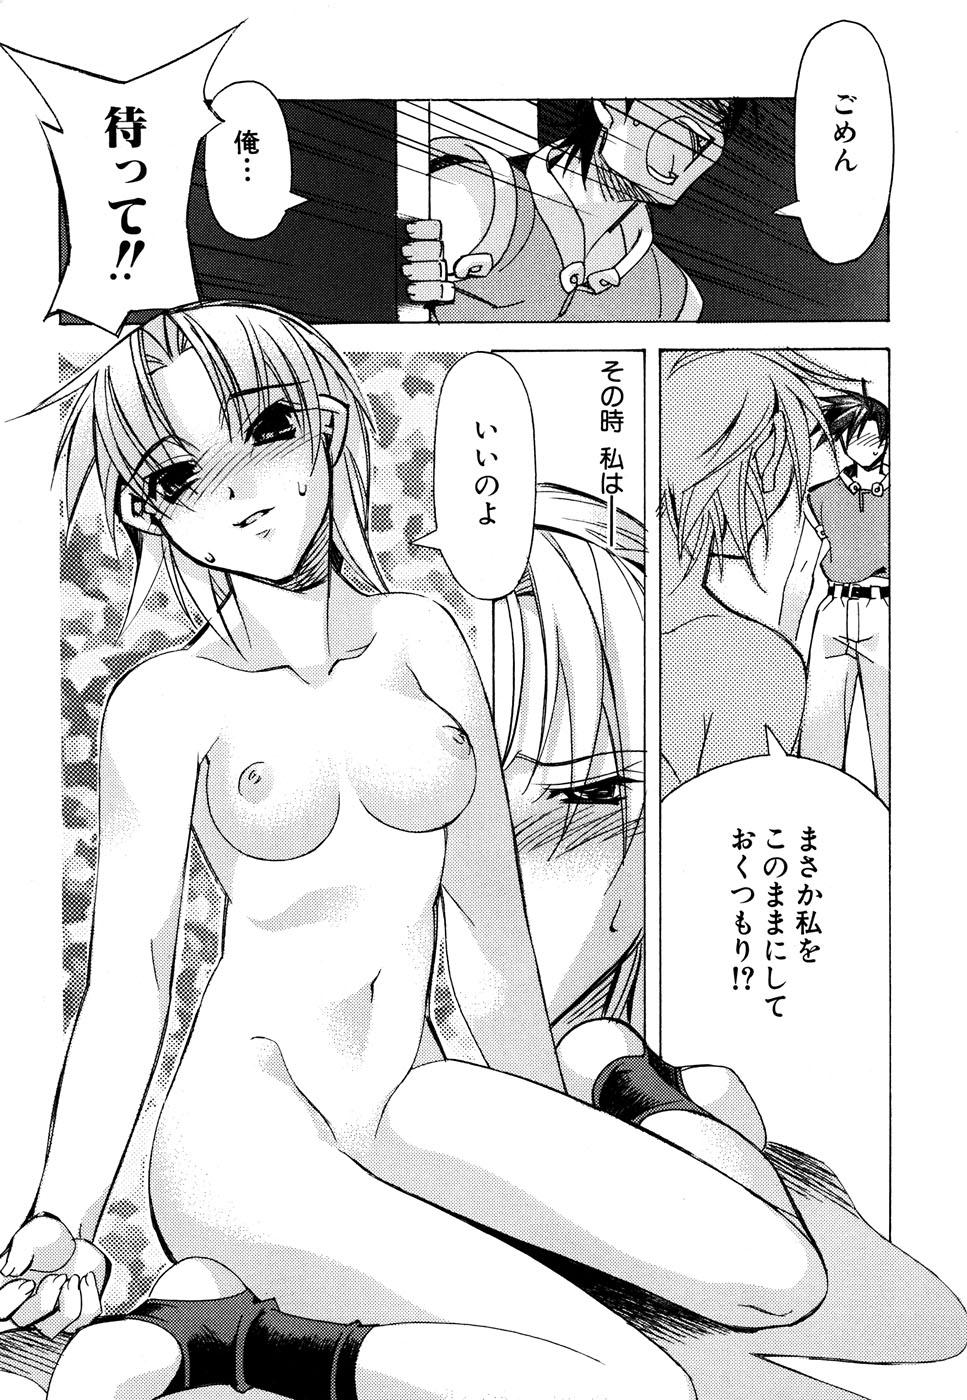 G-drive Vol.1 Ryoujokuhen 24